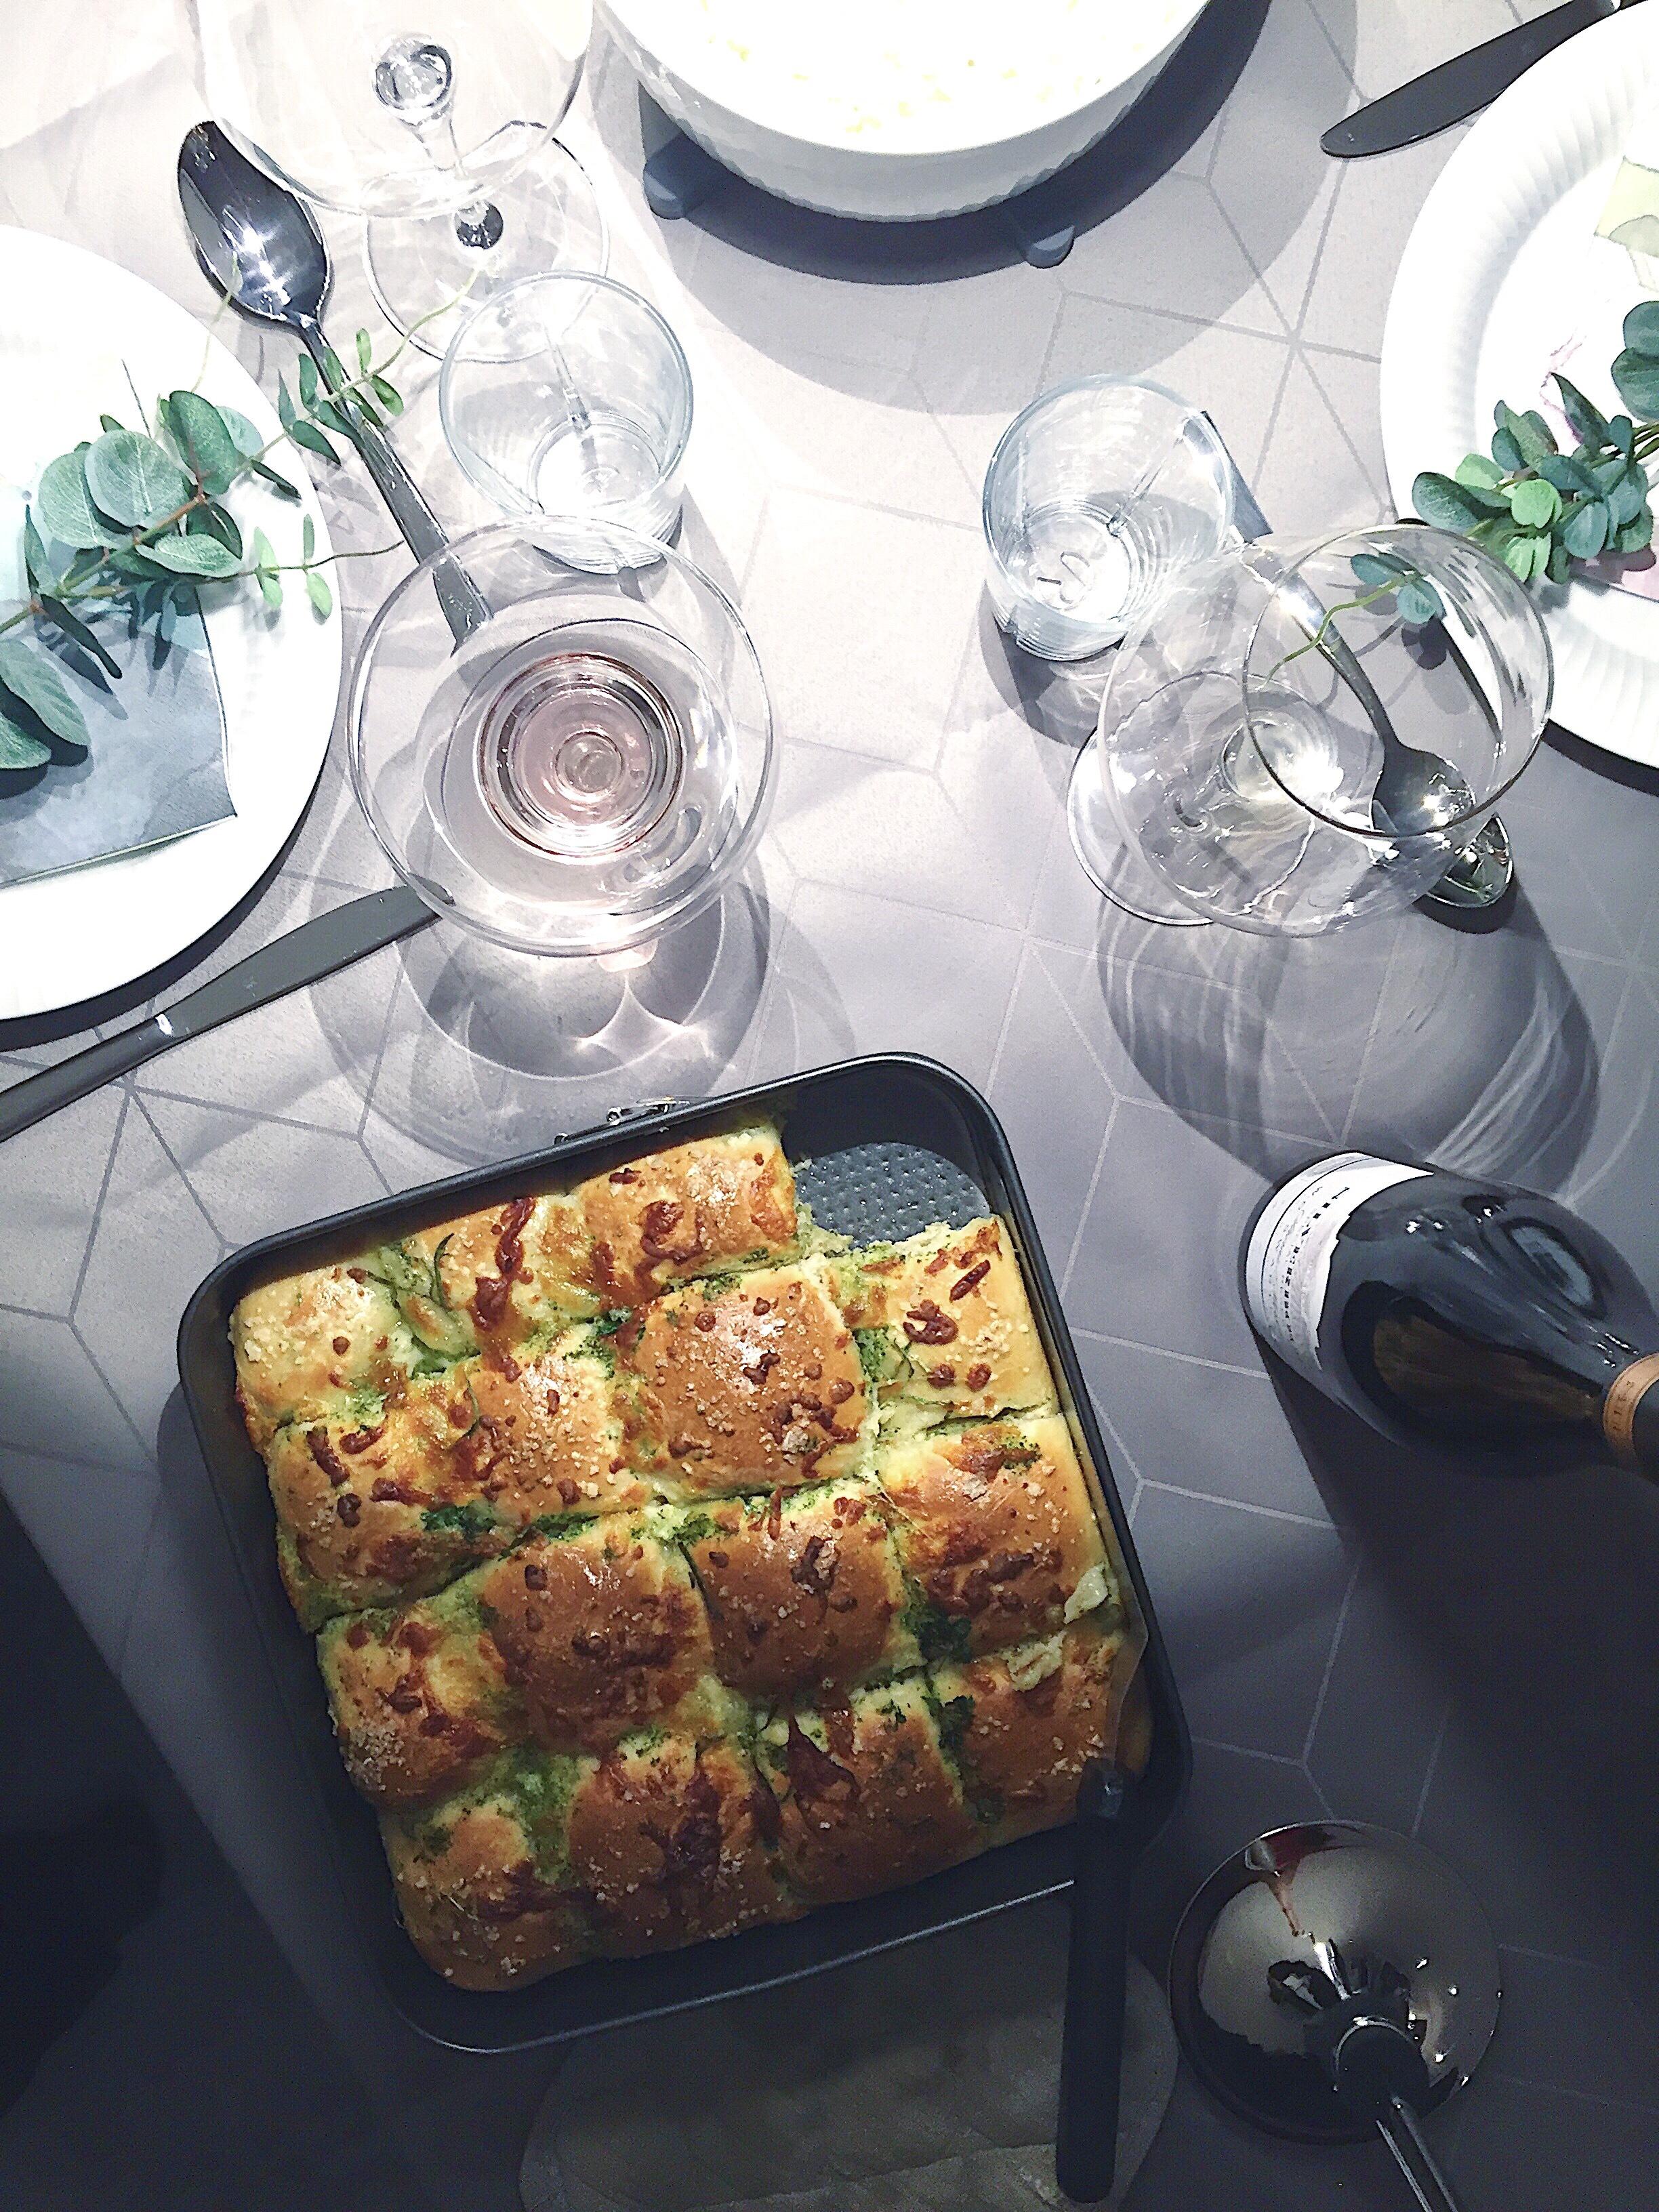 Pull apart brød med persille, hvidløg og mozzarella